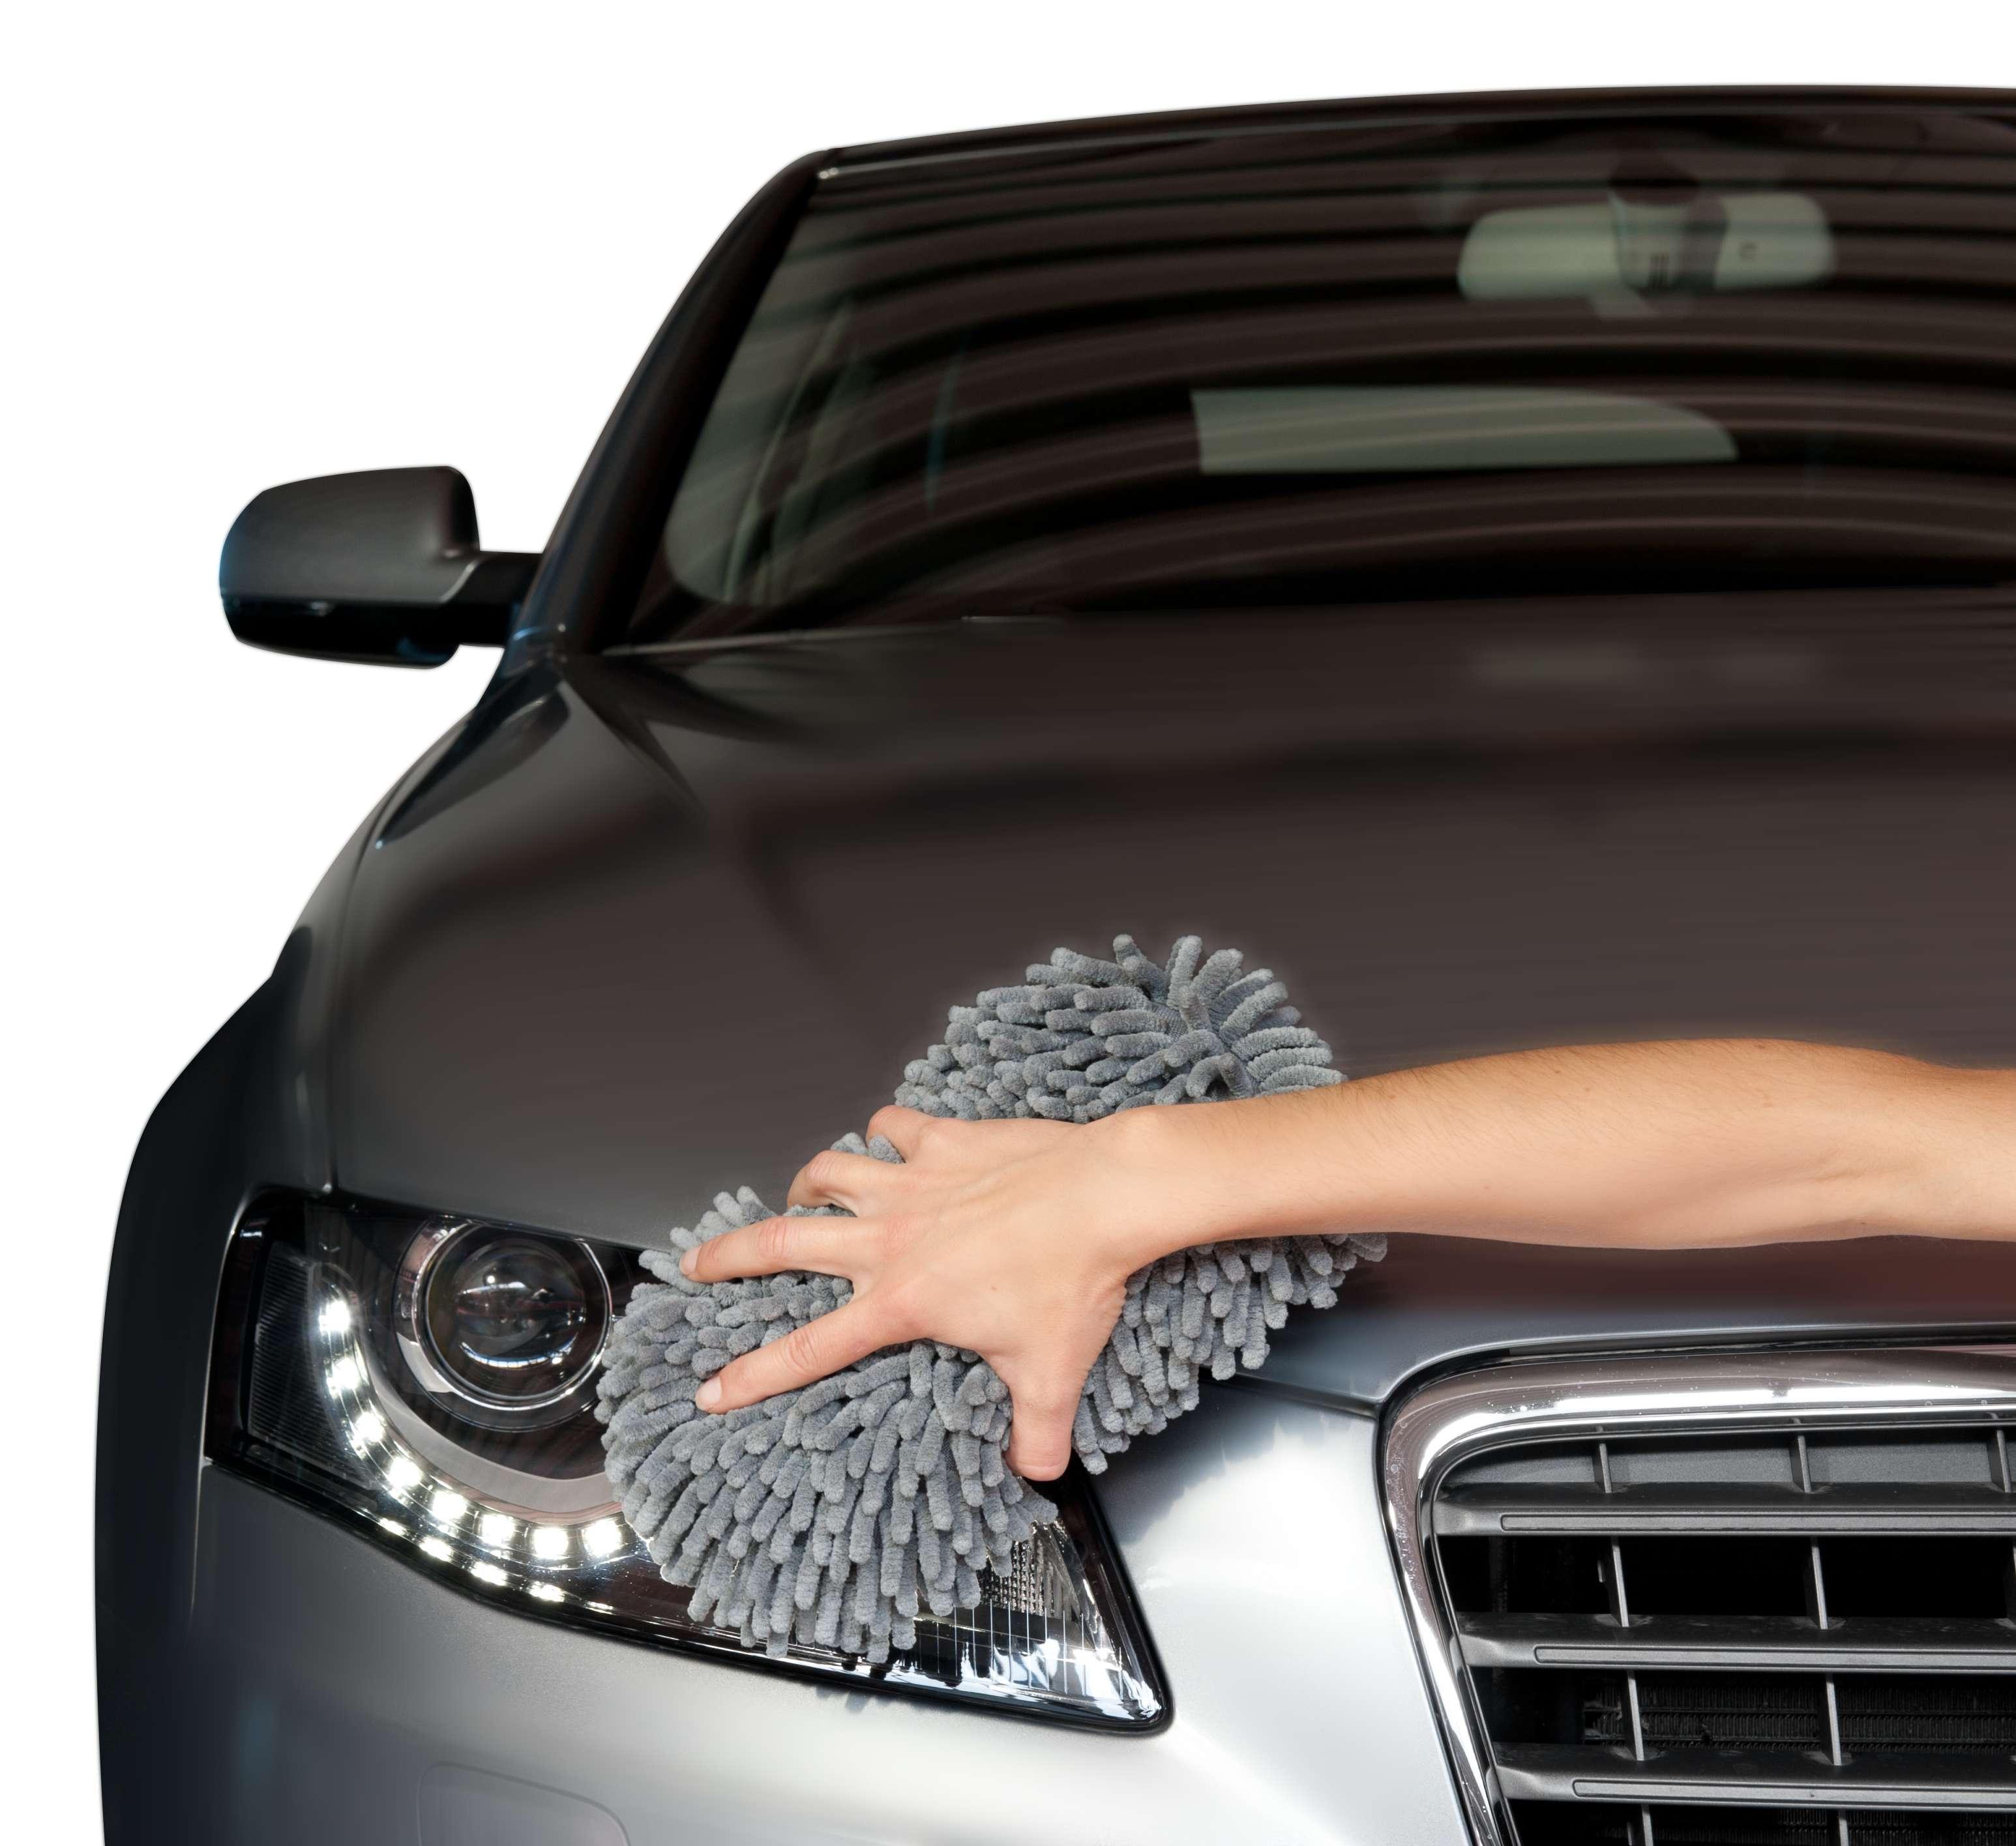 Car cleaning sponges WALSER 16097 rating